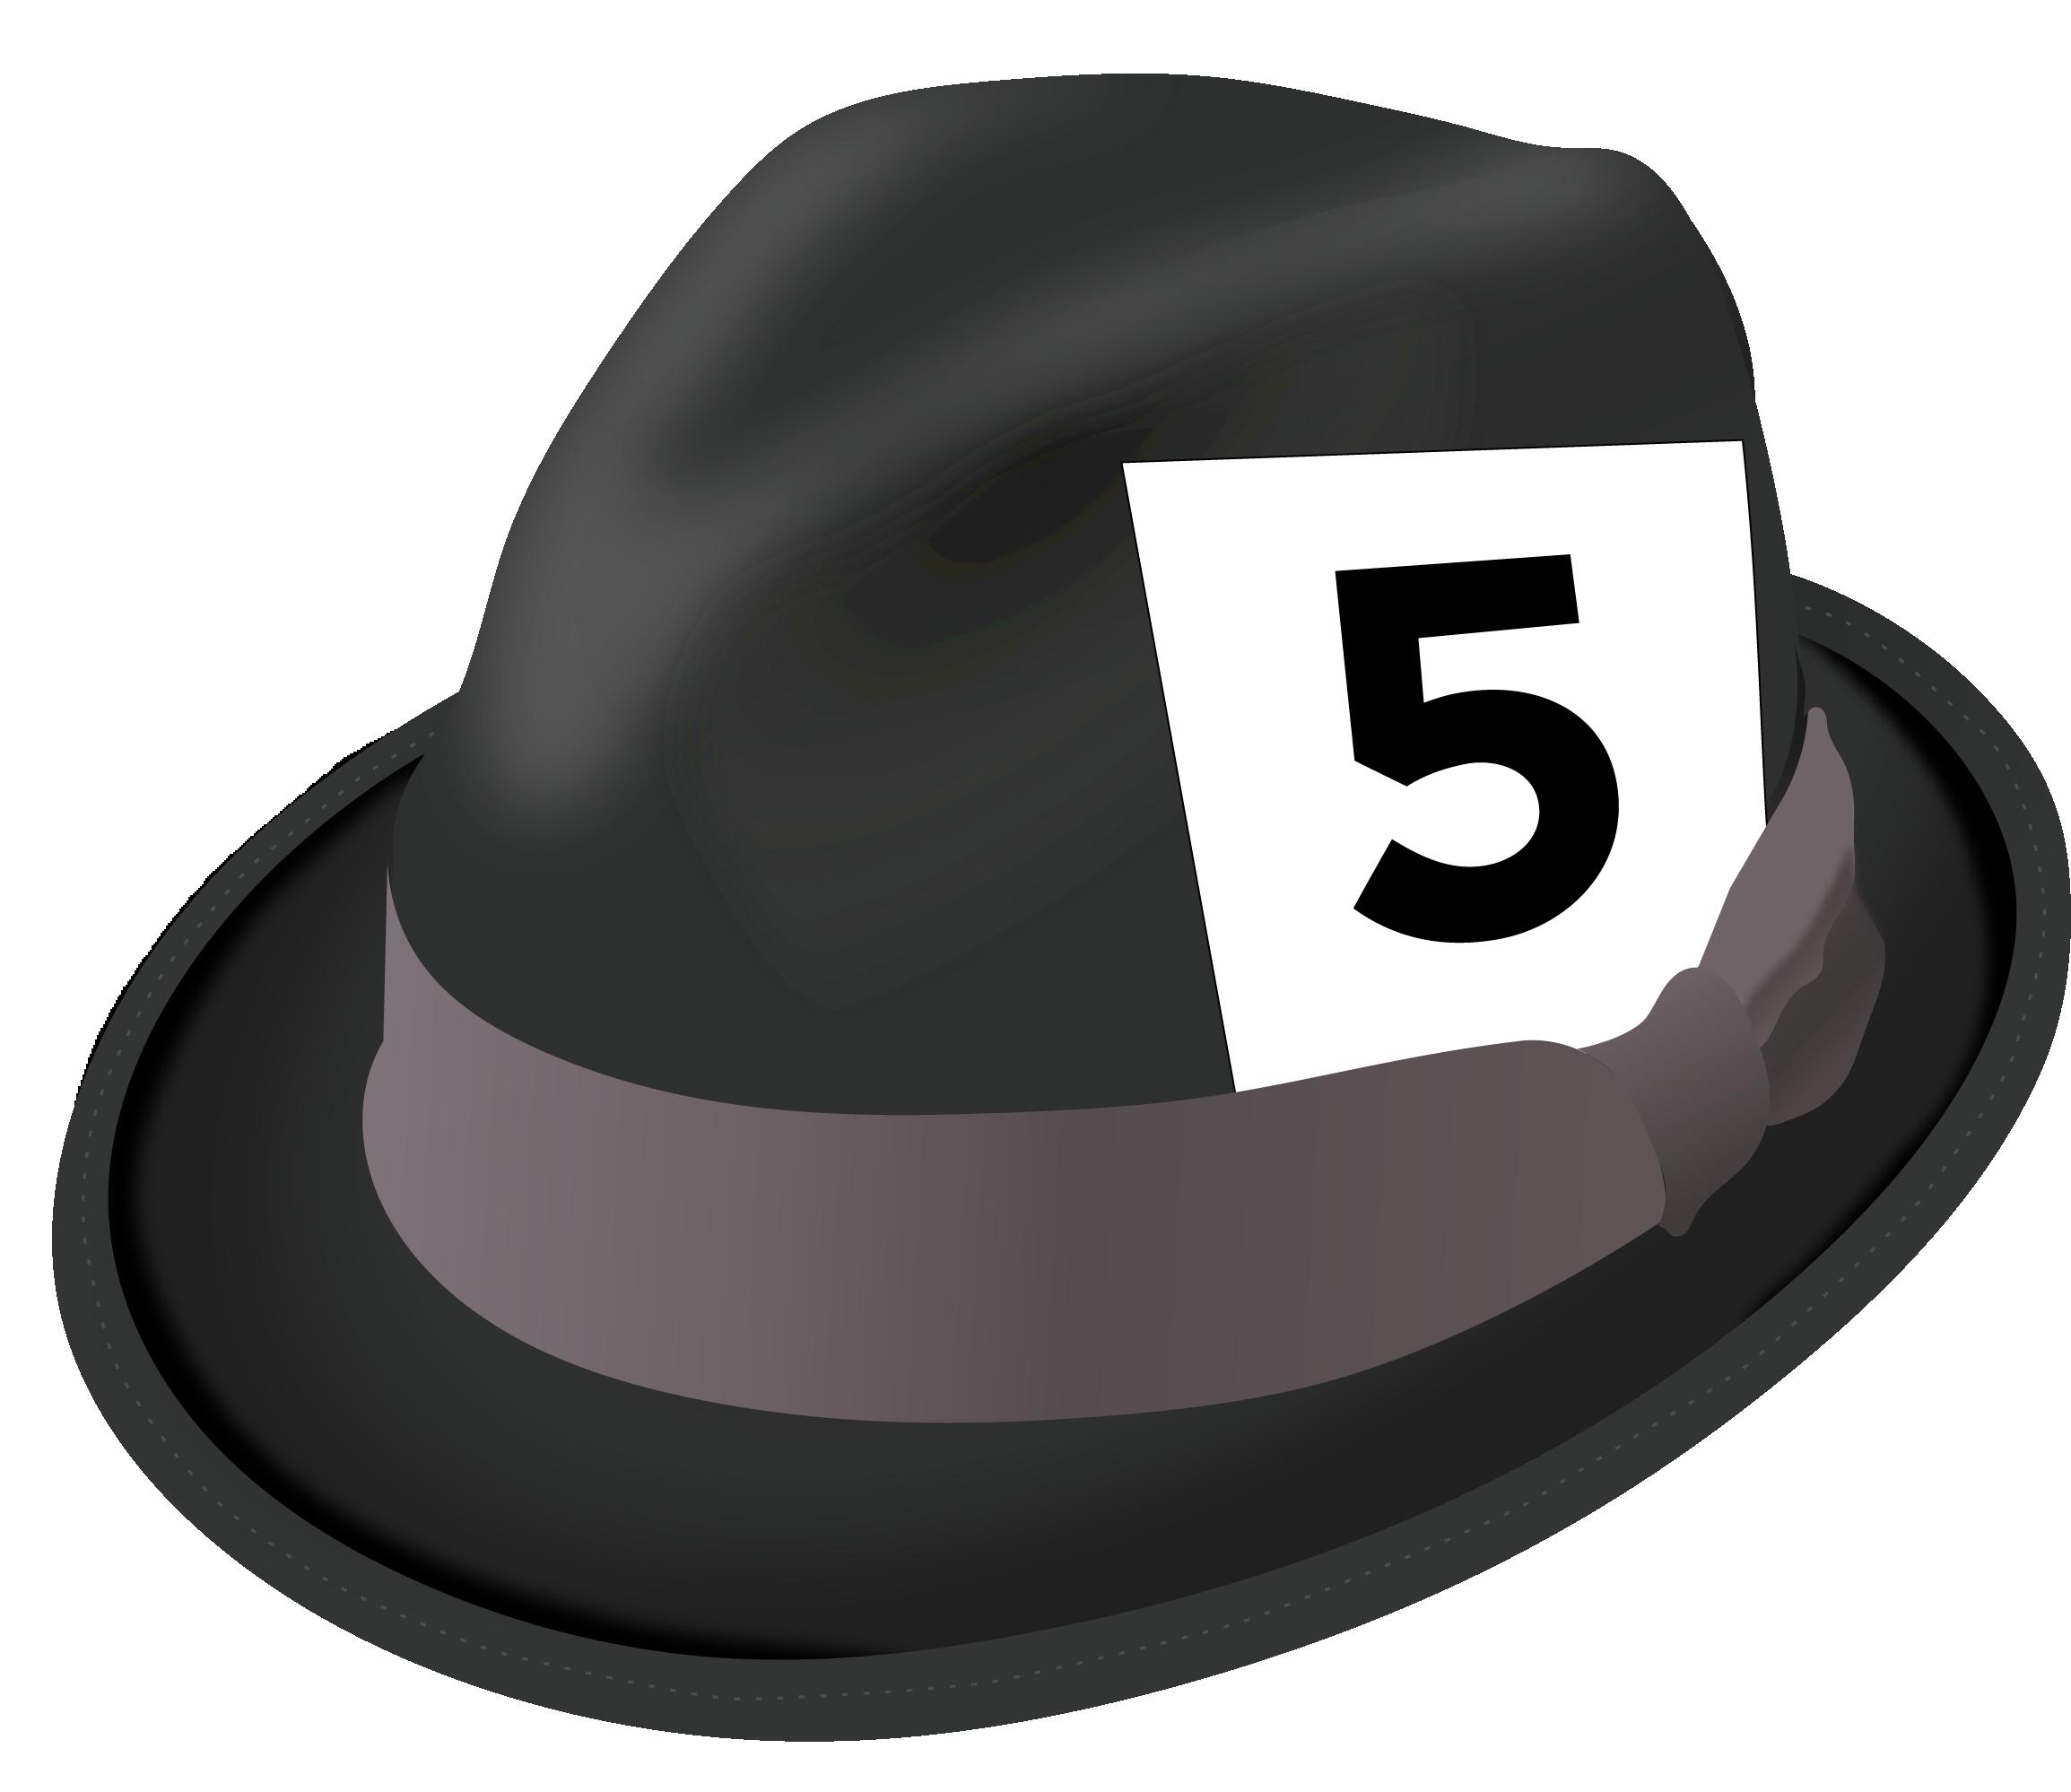 Fedora clipart press hat. Varsity math week national